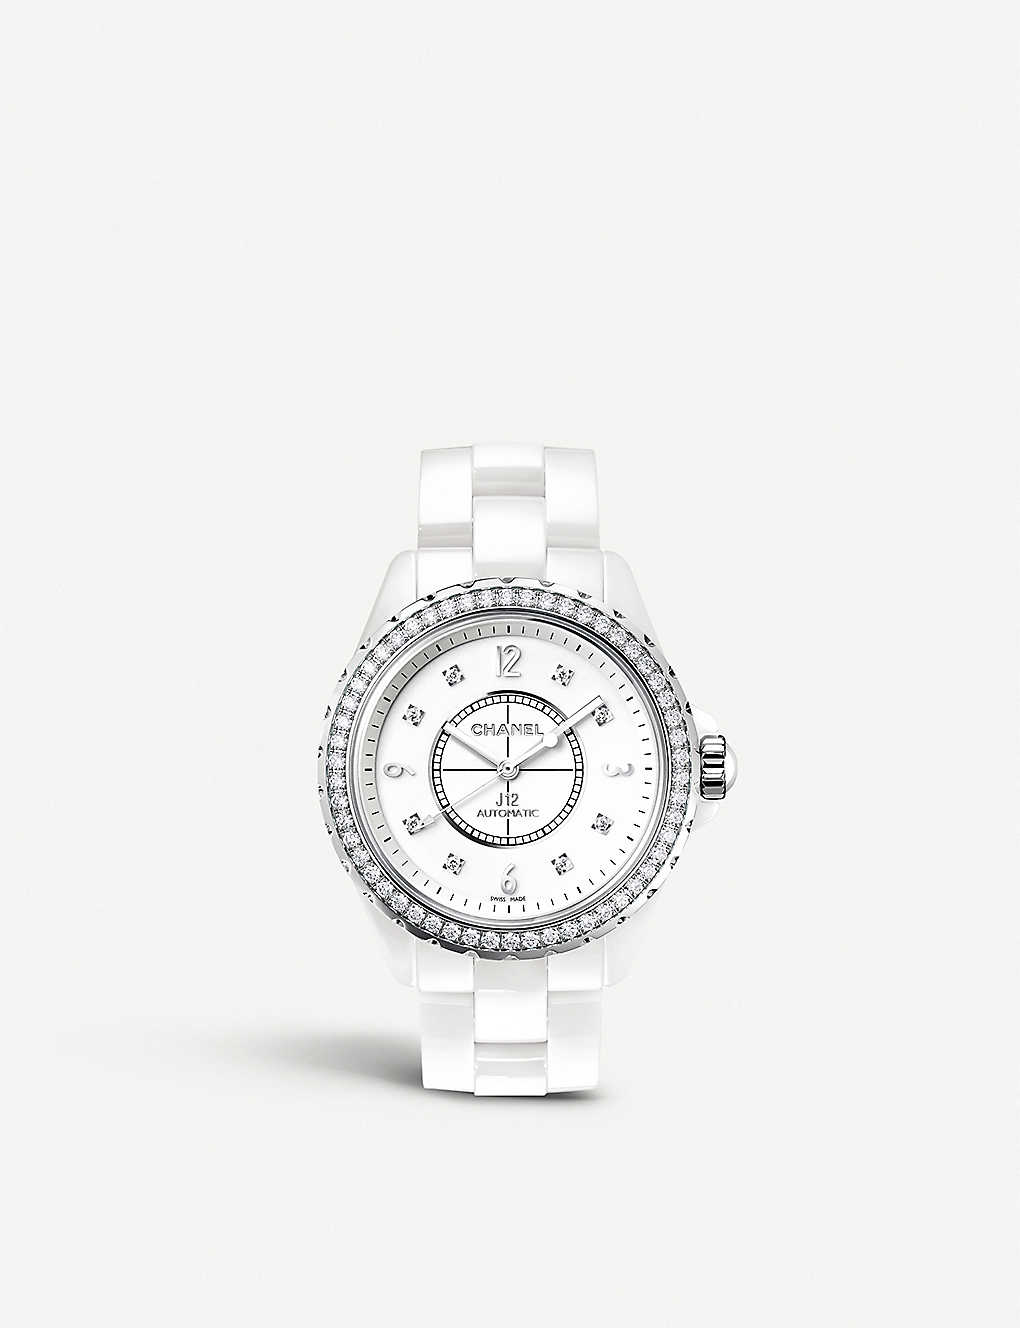 b8201e39 H3111 J12 33mm Diamonds high-tech ceramic, steel and diamond watch